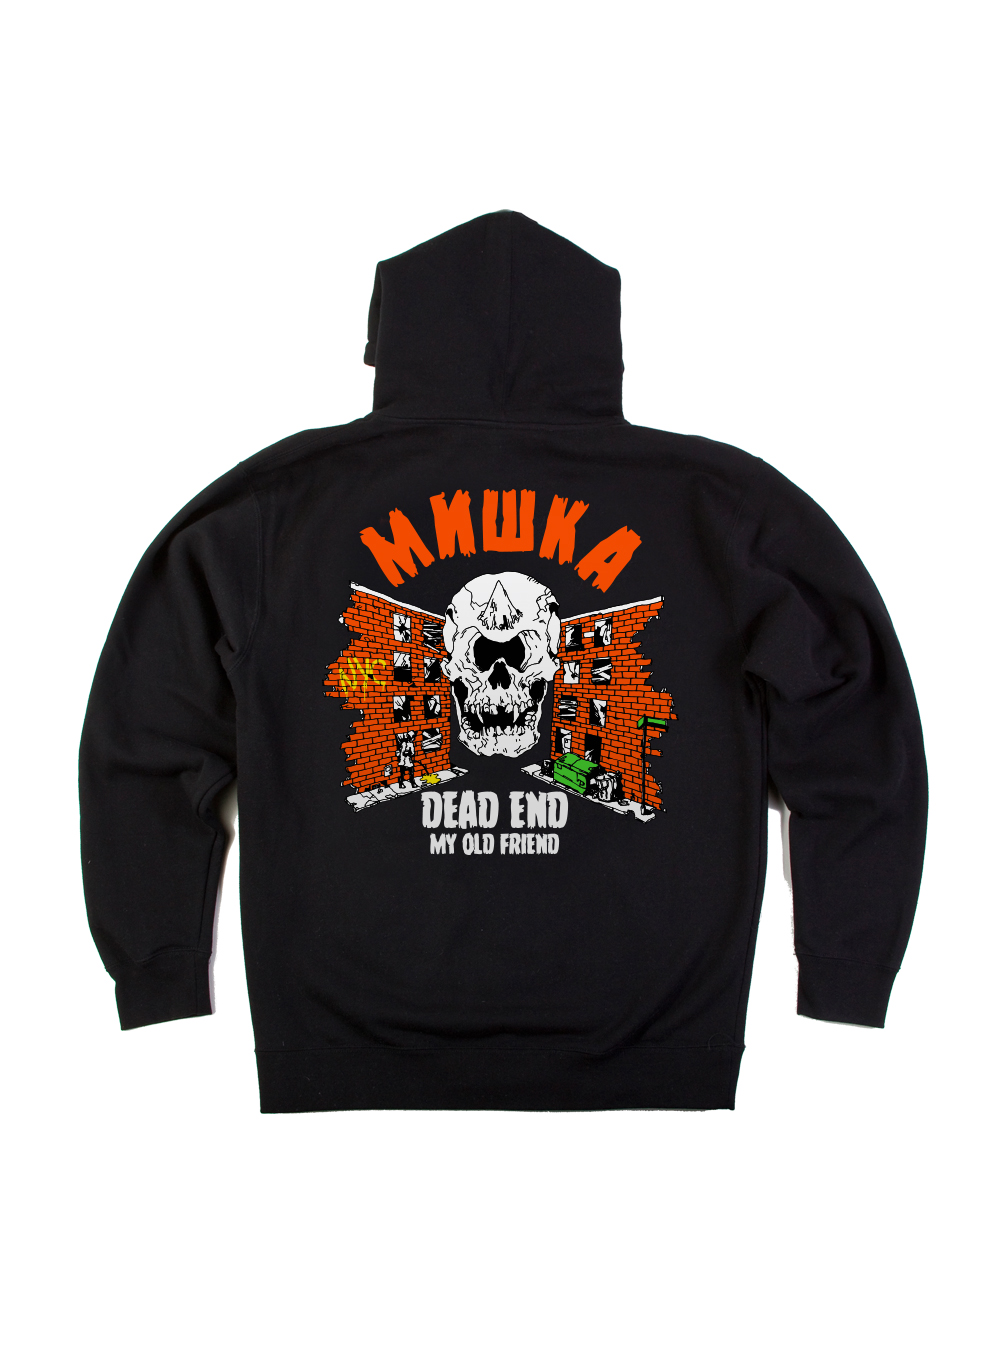 Dead End Pullover Hoodie